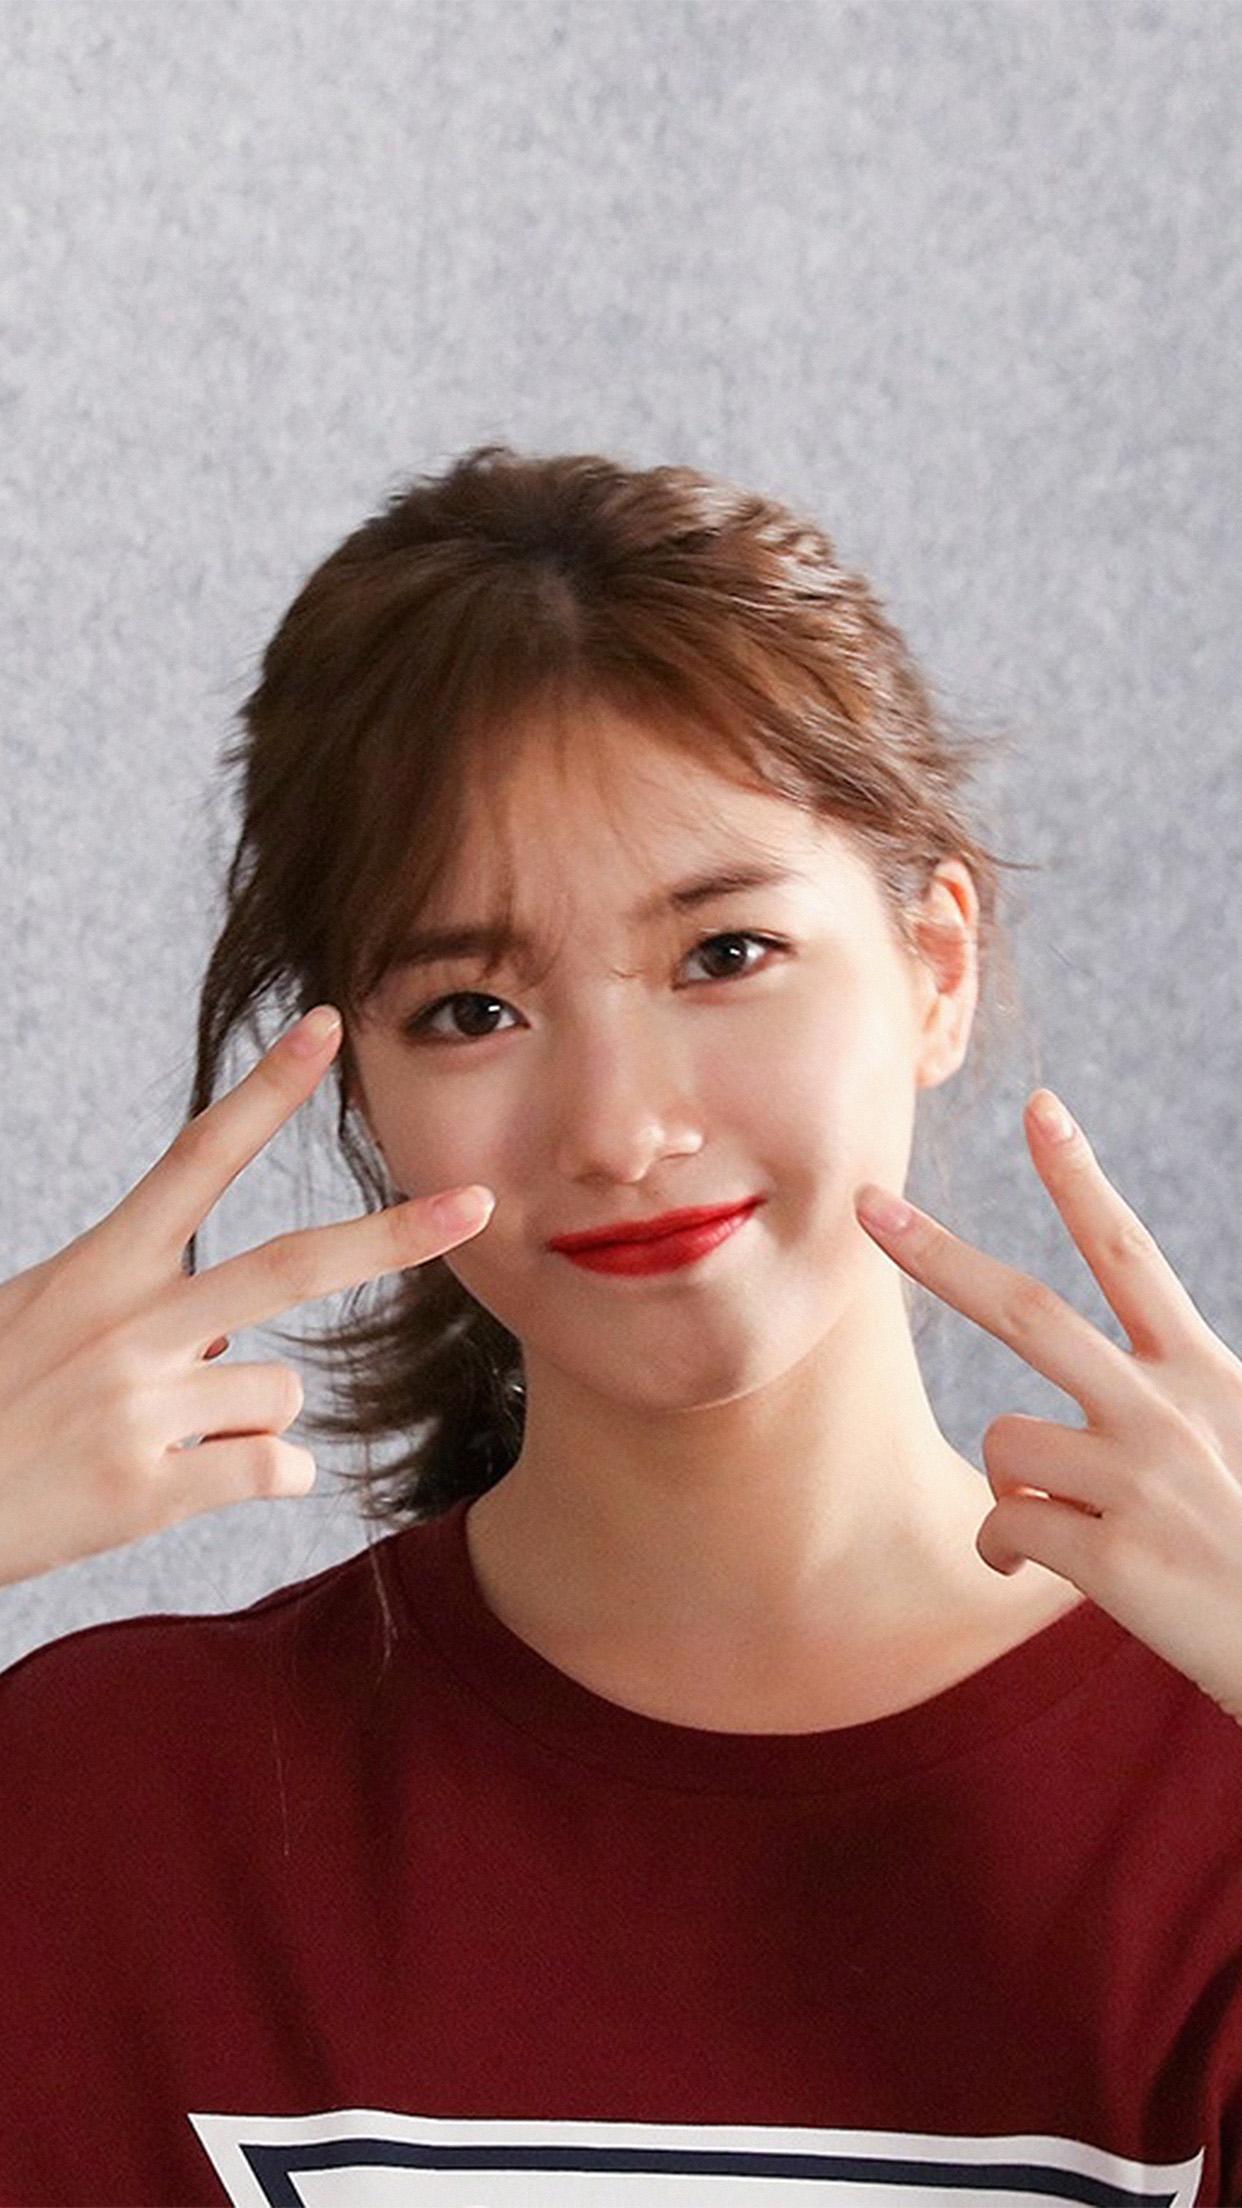 Cute Girls: Hn75-suji-cute-asian-girl-kpop-wallpaper